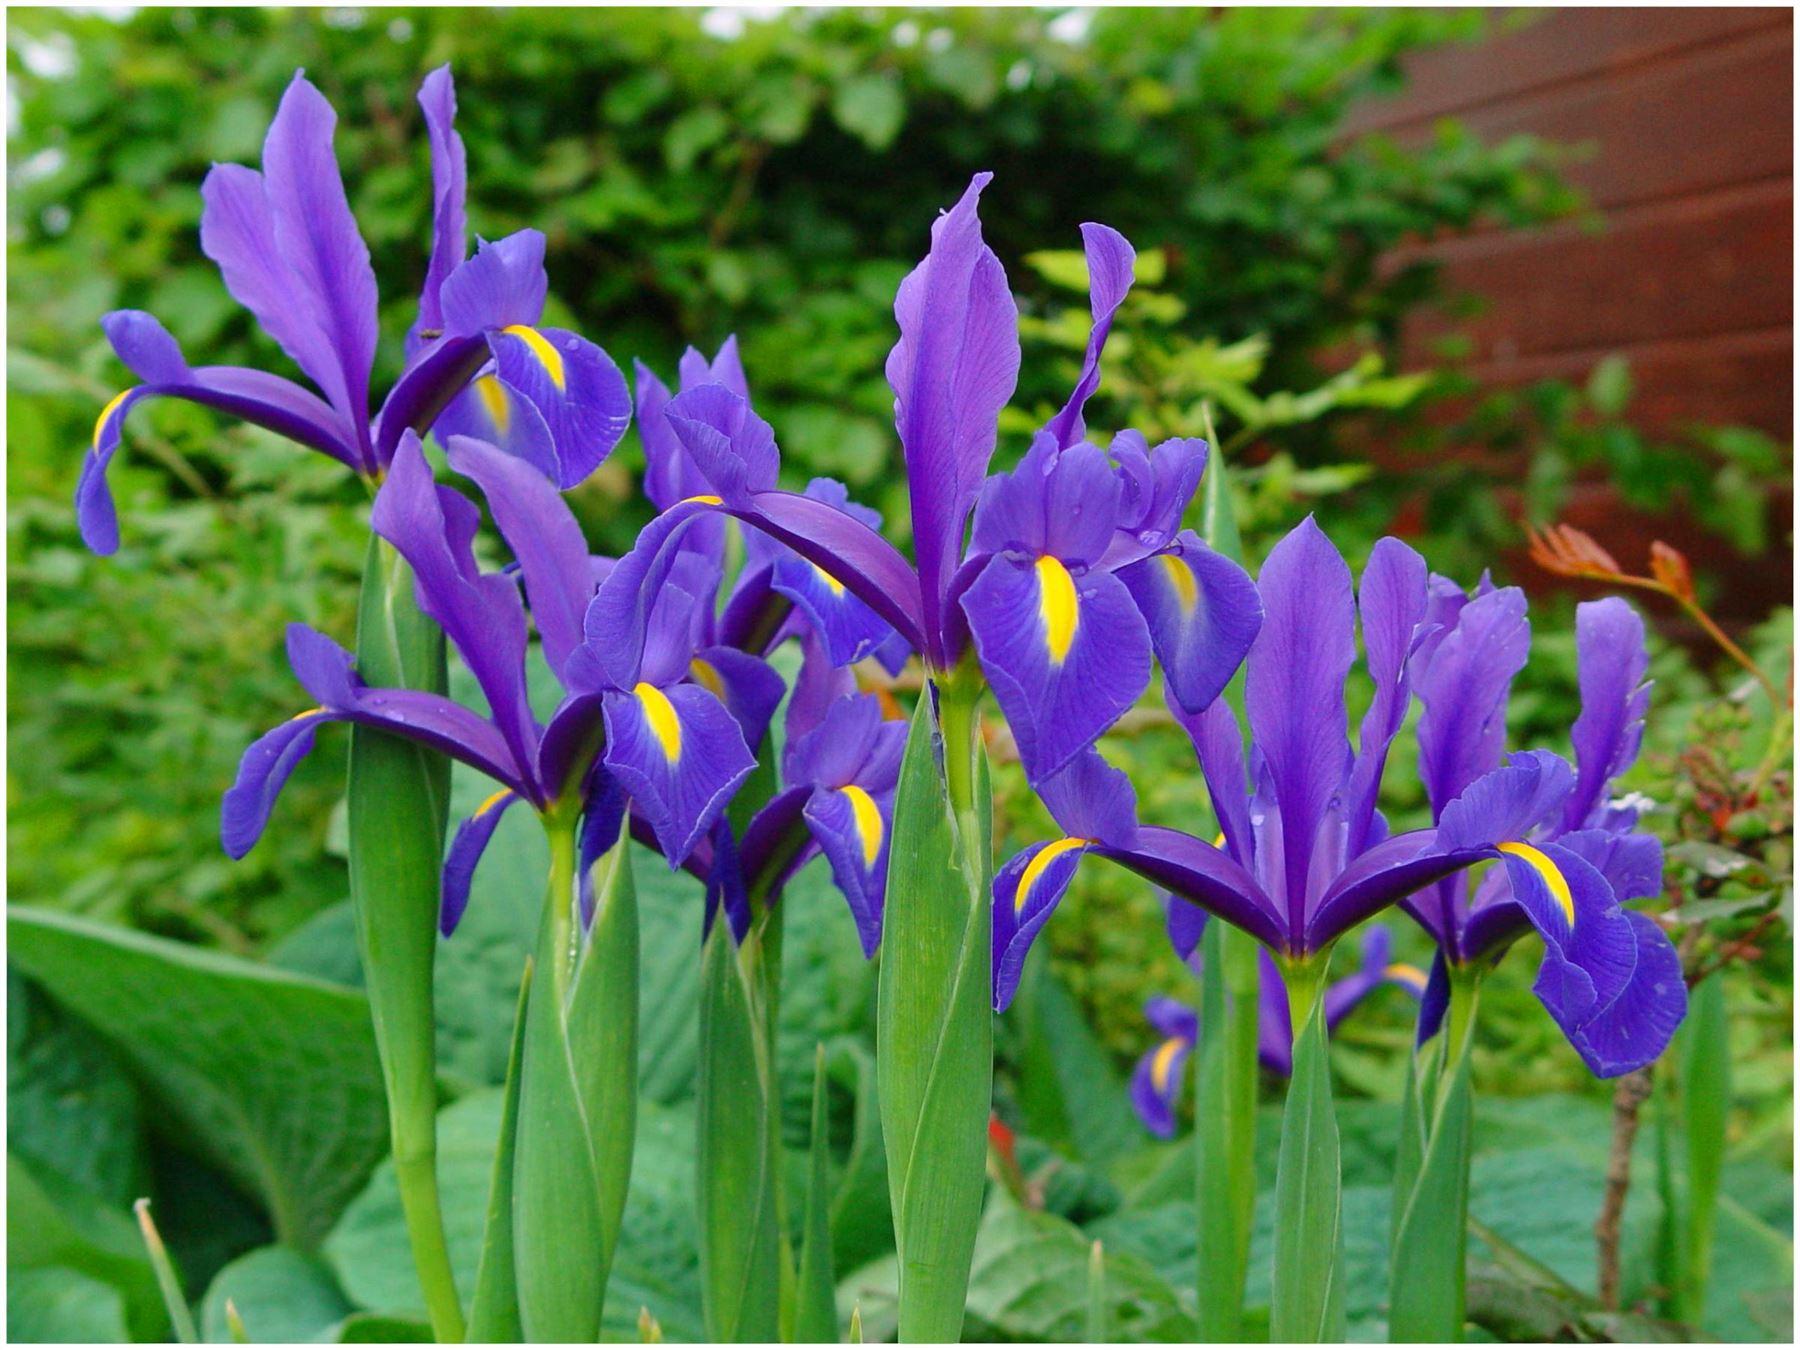 40 Bulbes Fleurs Vivaces Iris Bleu Neerlandais Printemps Ete Ebay